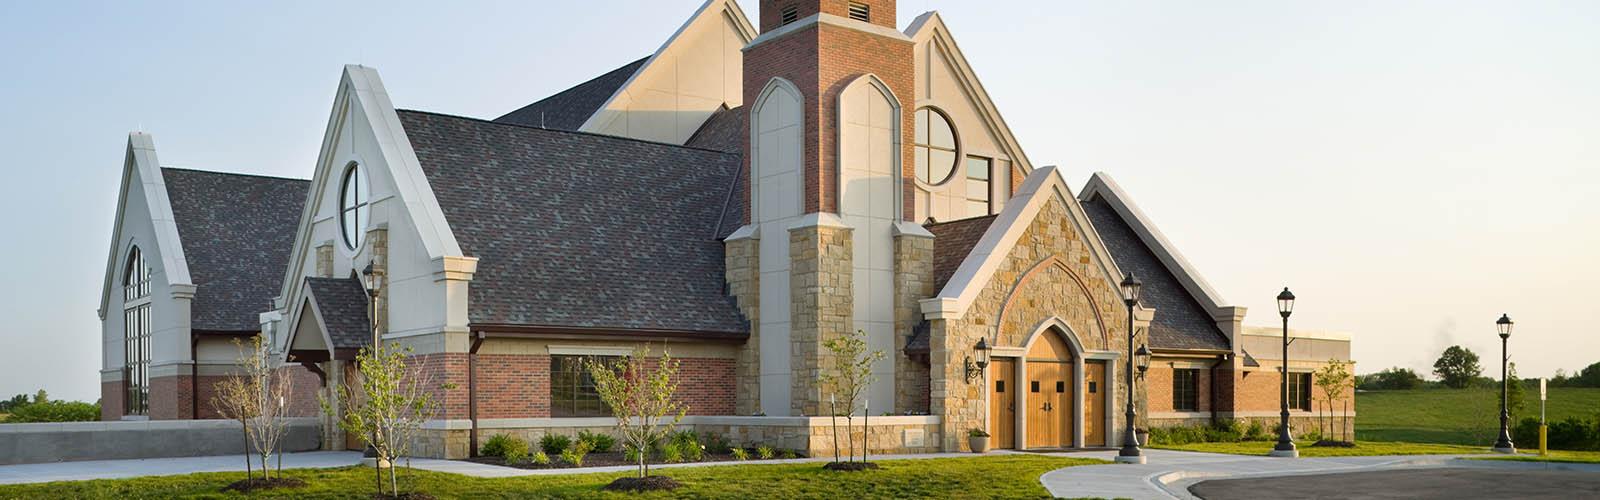 Good Shepherd Catholic Church 1